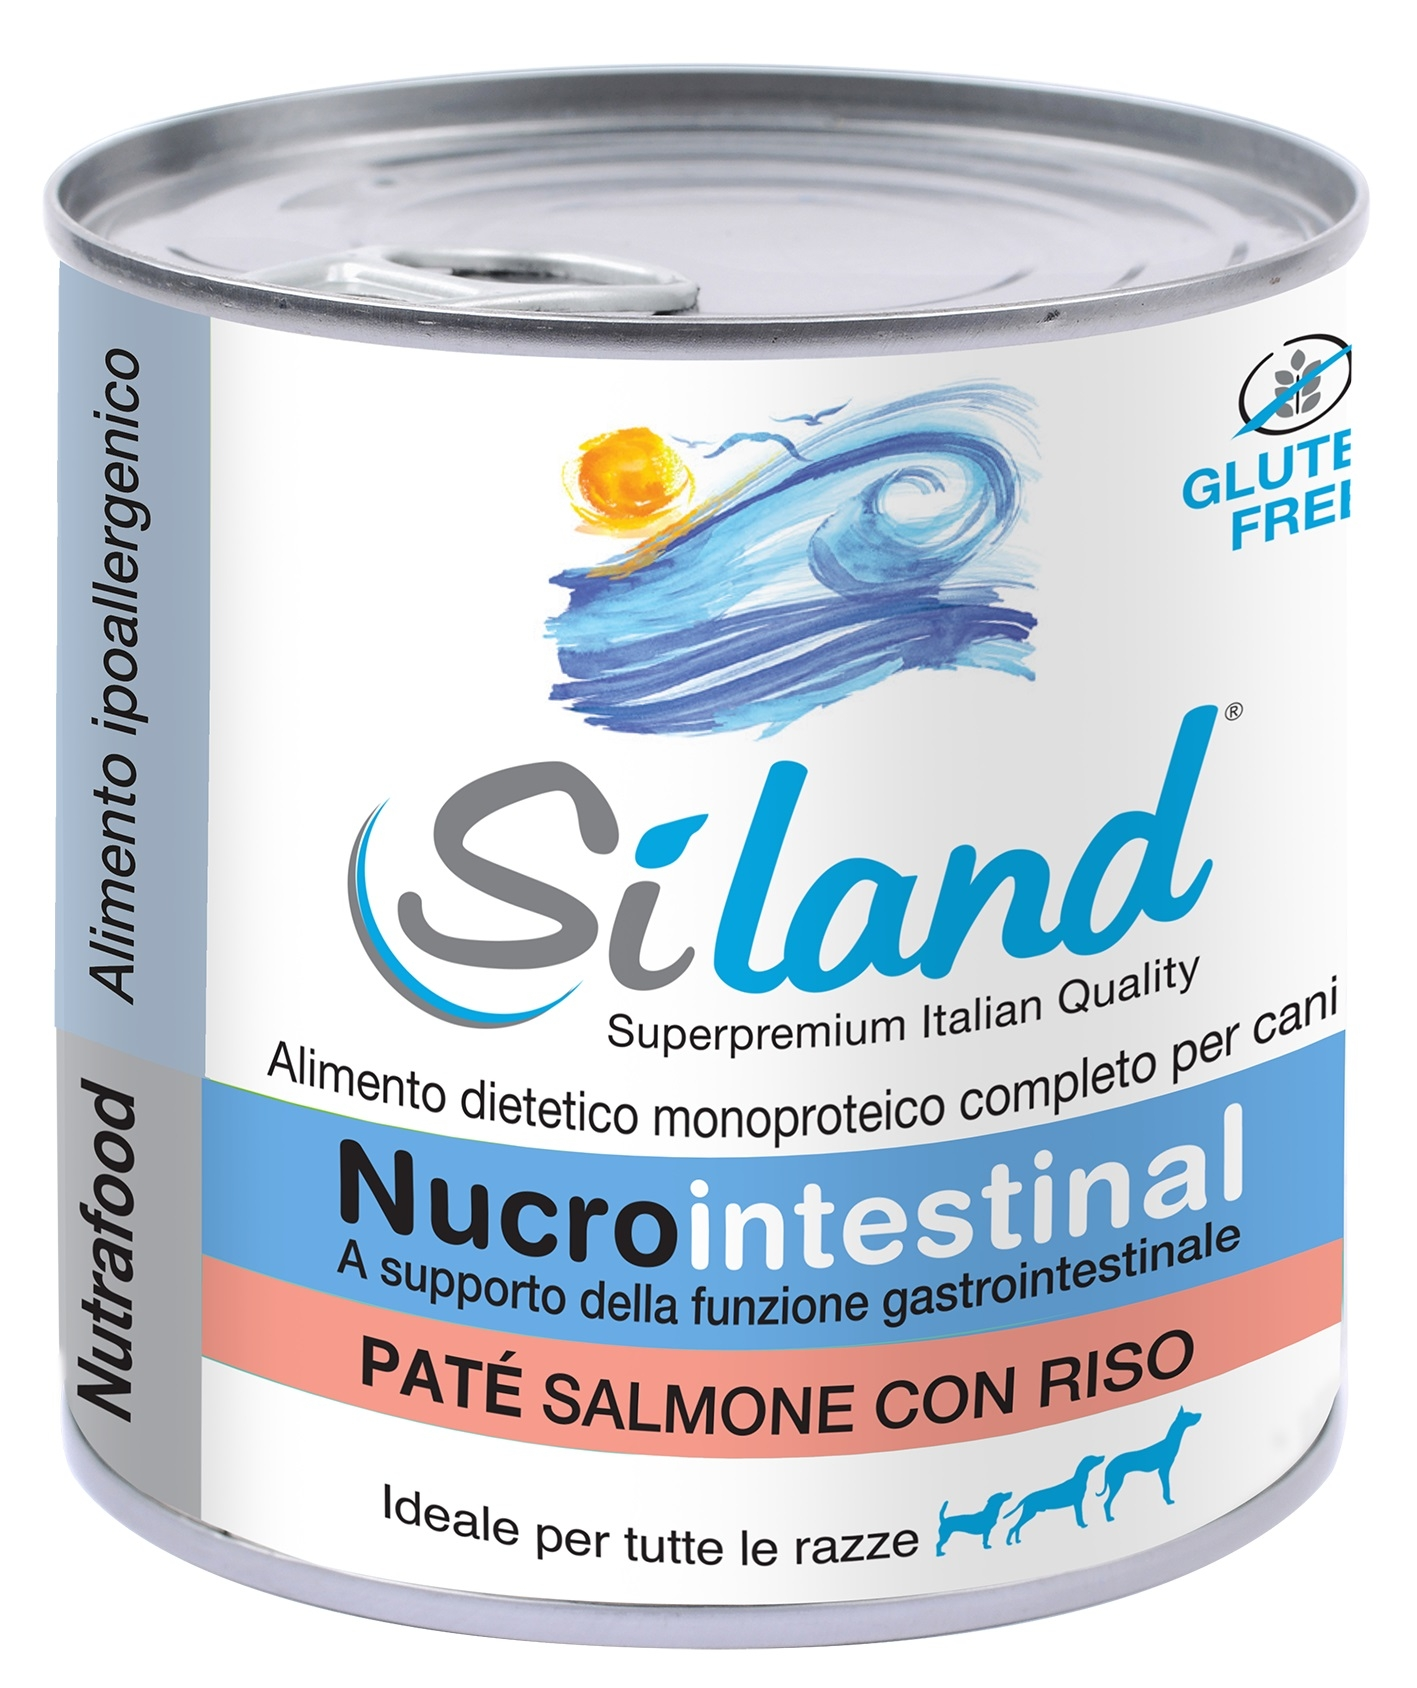 SILAND nucrointestinal PATE SALMONE CON RISO Alim